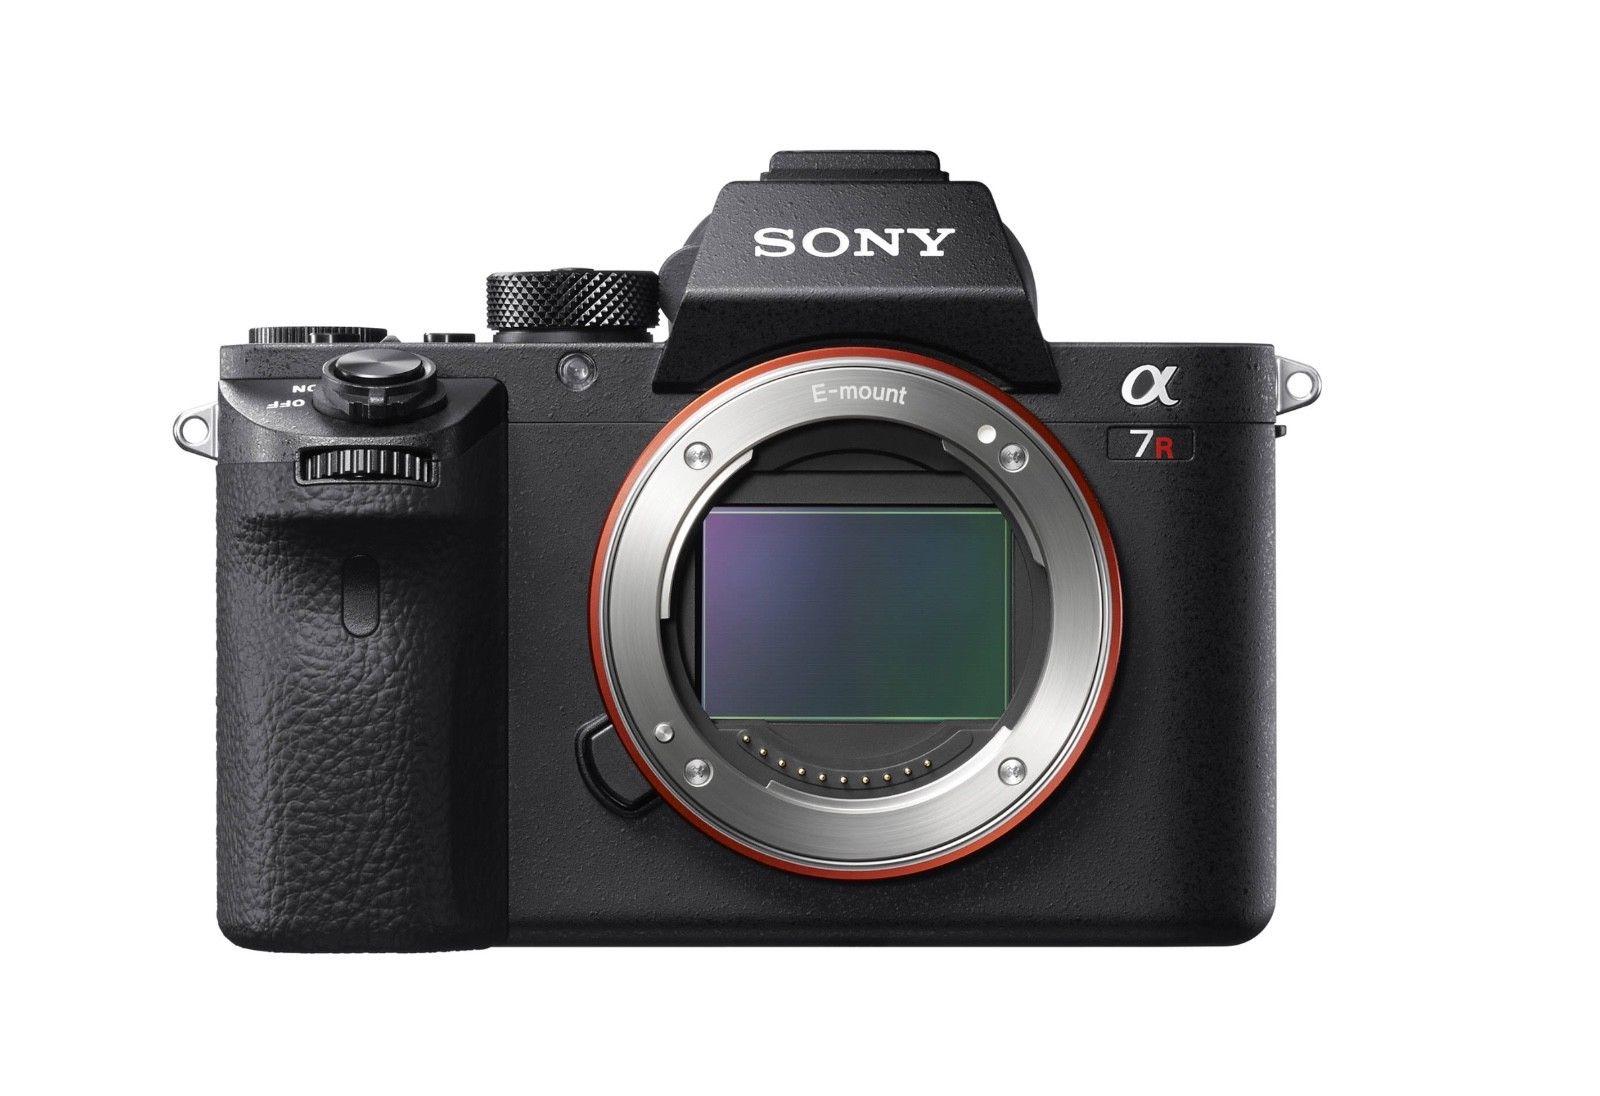 Sony Alpha 7R II a7R2 A7RII ILCE-7RM2 Vollformat Kamera